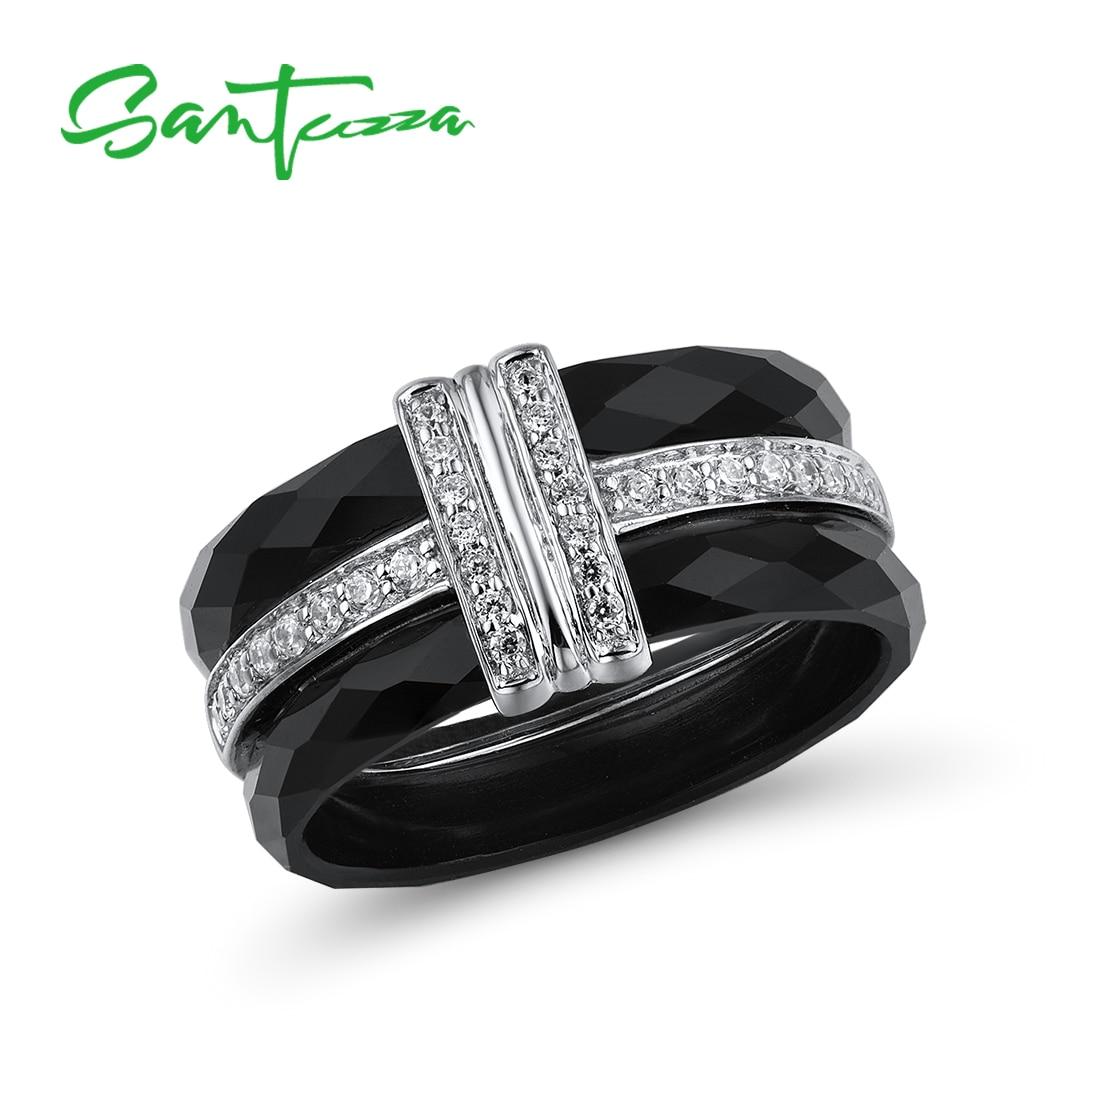 SANTUZZA Silver Rings For Women Pure 925 Sterling Silver Round Black Ceramic Cubic Zirconia Classical Anillos Fine Jewelry